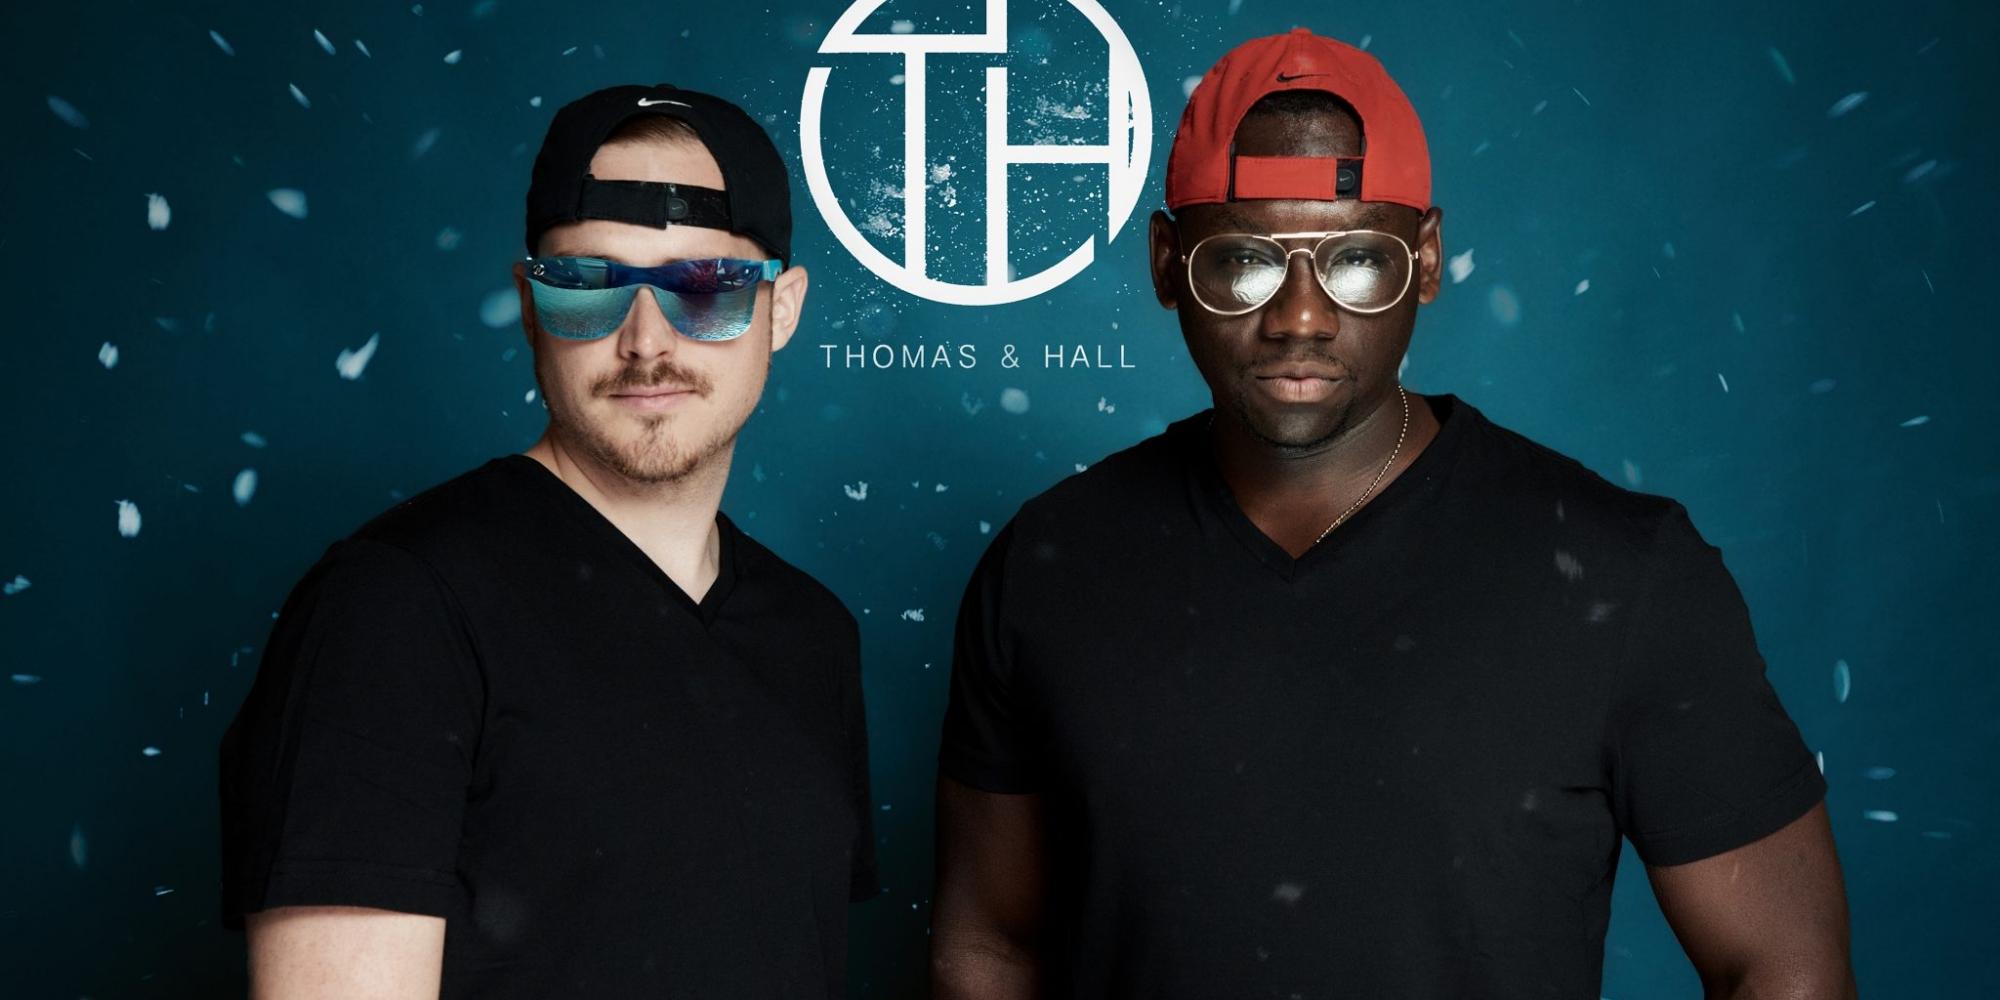 Thomas & Hall 11524